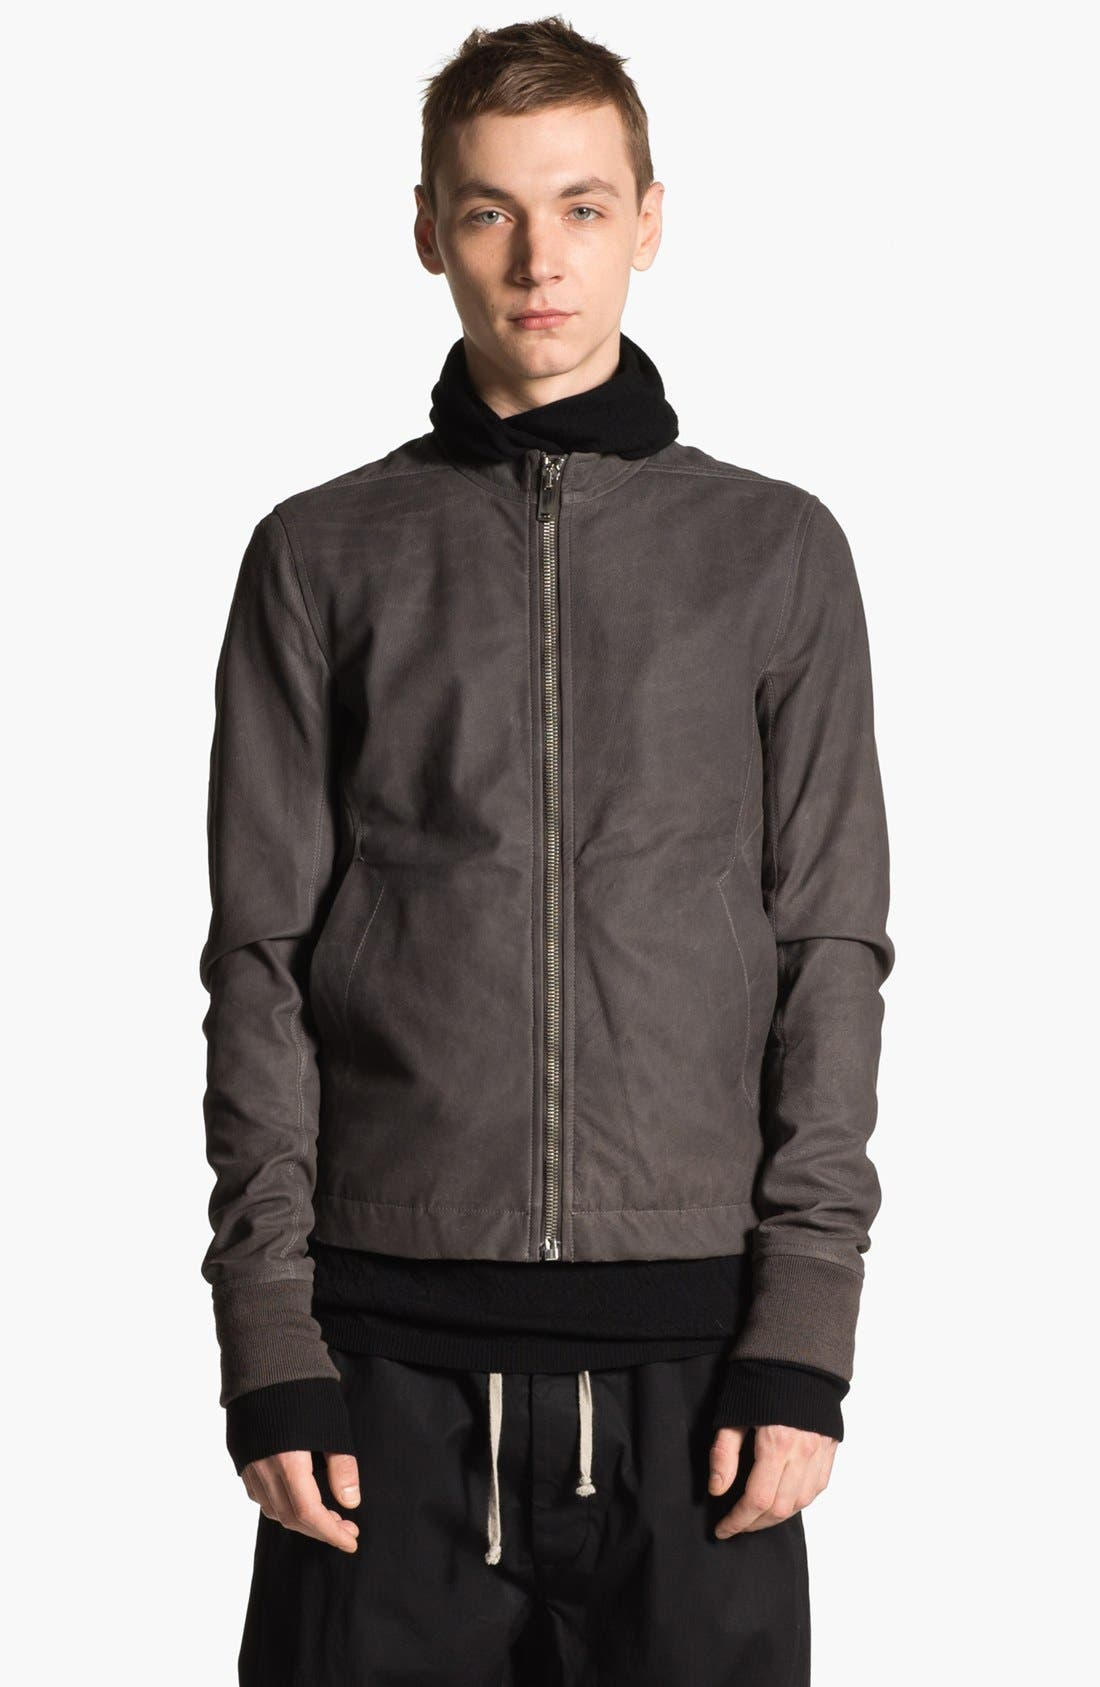 Main Image - Rick Owens 'Sternberg' Lambskin Leather Bomber Jacket